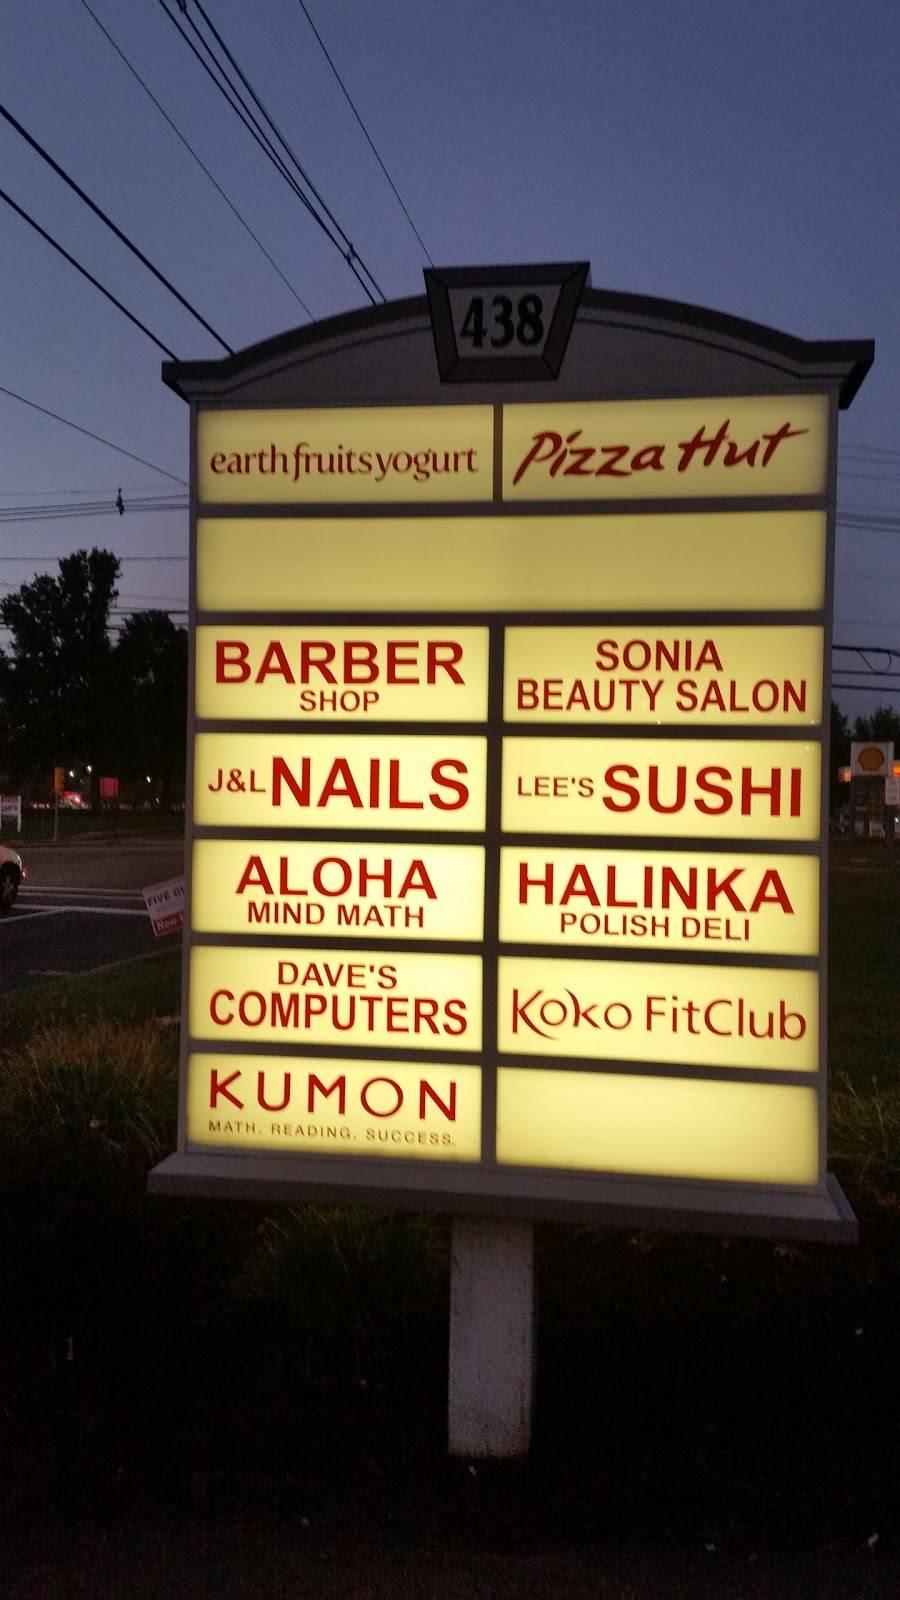 Lees Sushi | restaurant | 438 Amwell Rd, Hillsborough Township, NJ 08844, USA | 9088293271 OR +1 908-829-3271